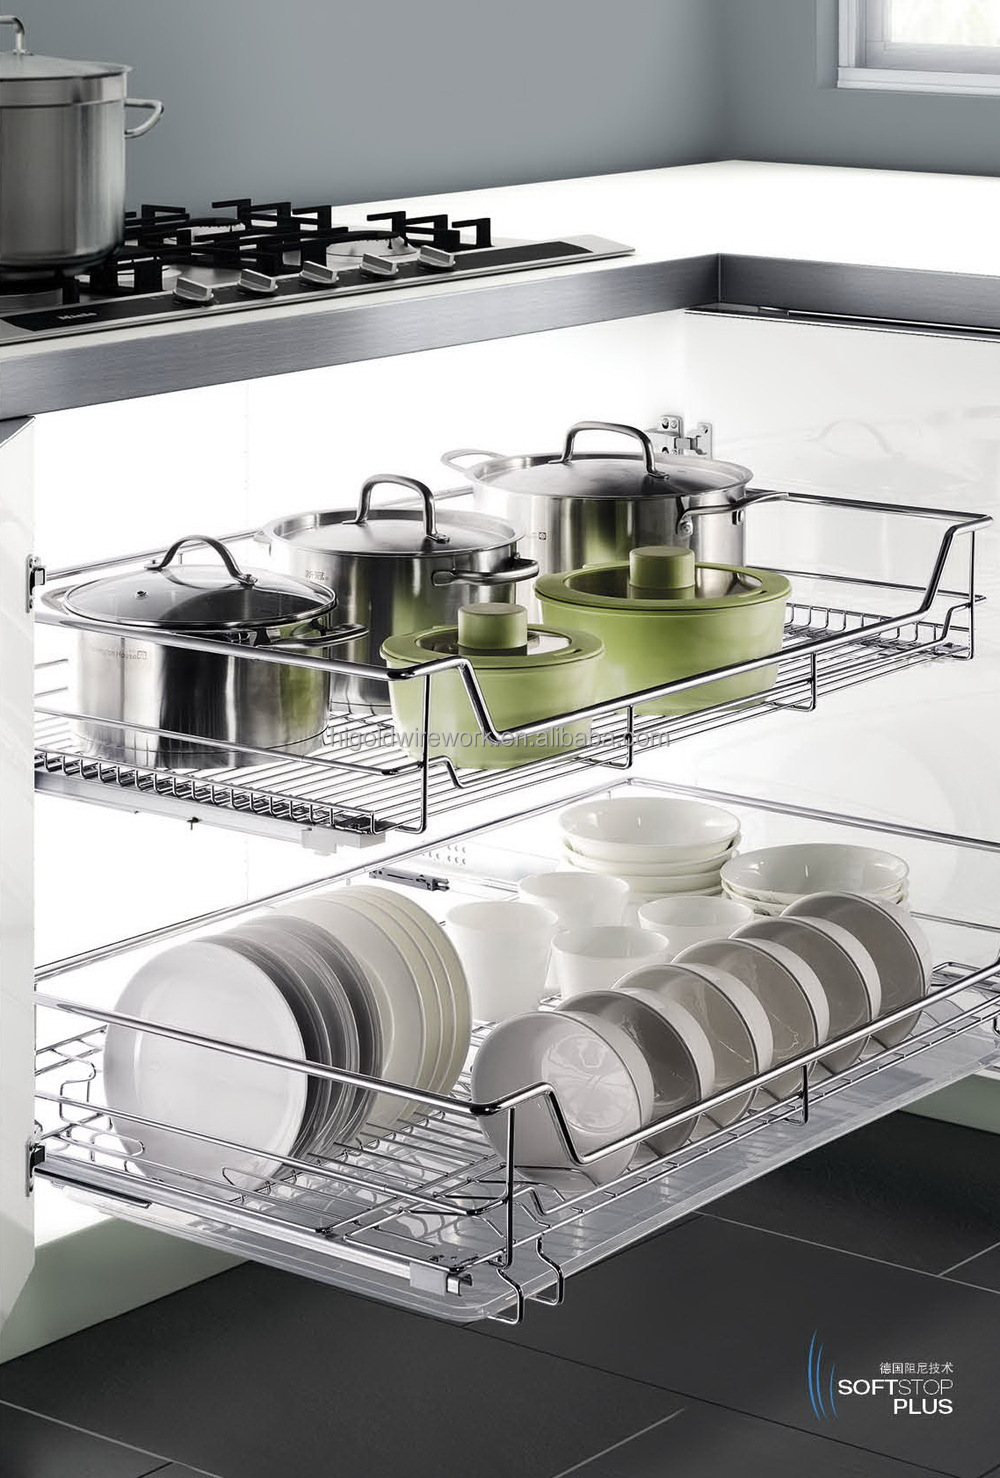 Hot Selling Kitchen Slide Out Storage Wire Basket - Buy Slide Out ...